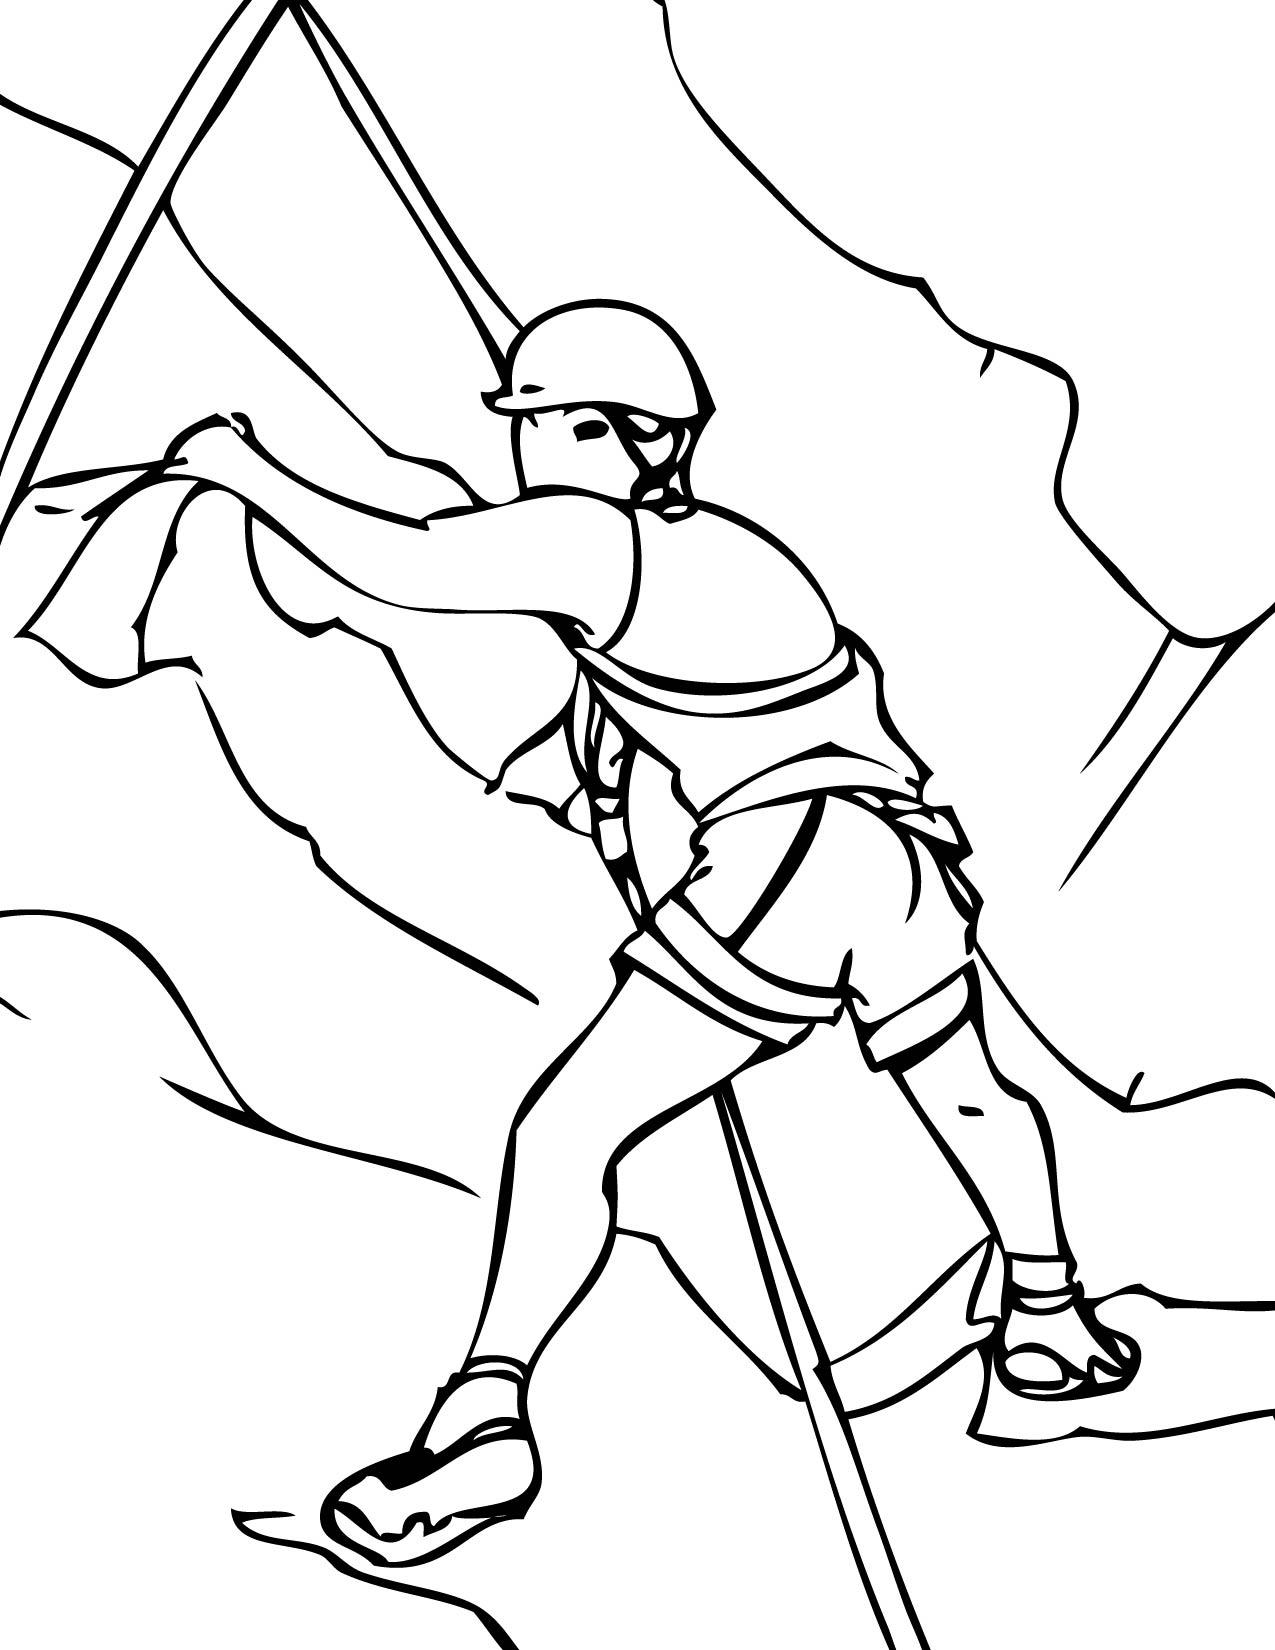 Mountain Climbing Drawing At Getdrawings